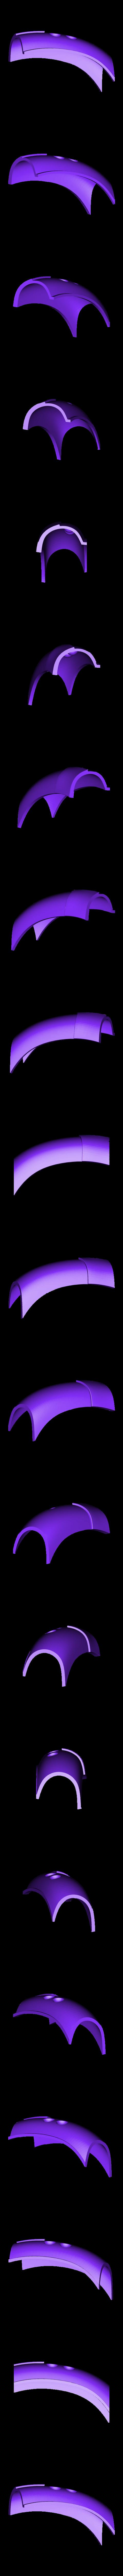 Part 11 v1.stl Download STL file ARF Trooper Helmet • 3D print object, VillainousPropShop